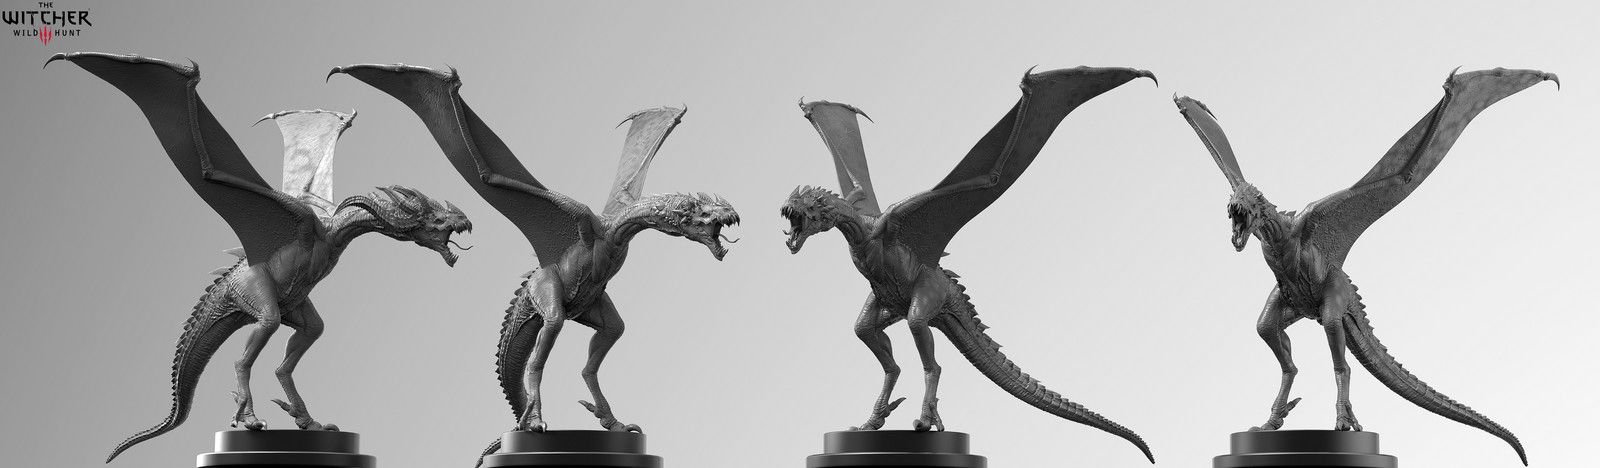 Witcher 3 Wyvern, Marcin Klicki on ArtStation at https://www.artstation.com/artwork/RqJLv